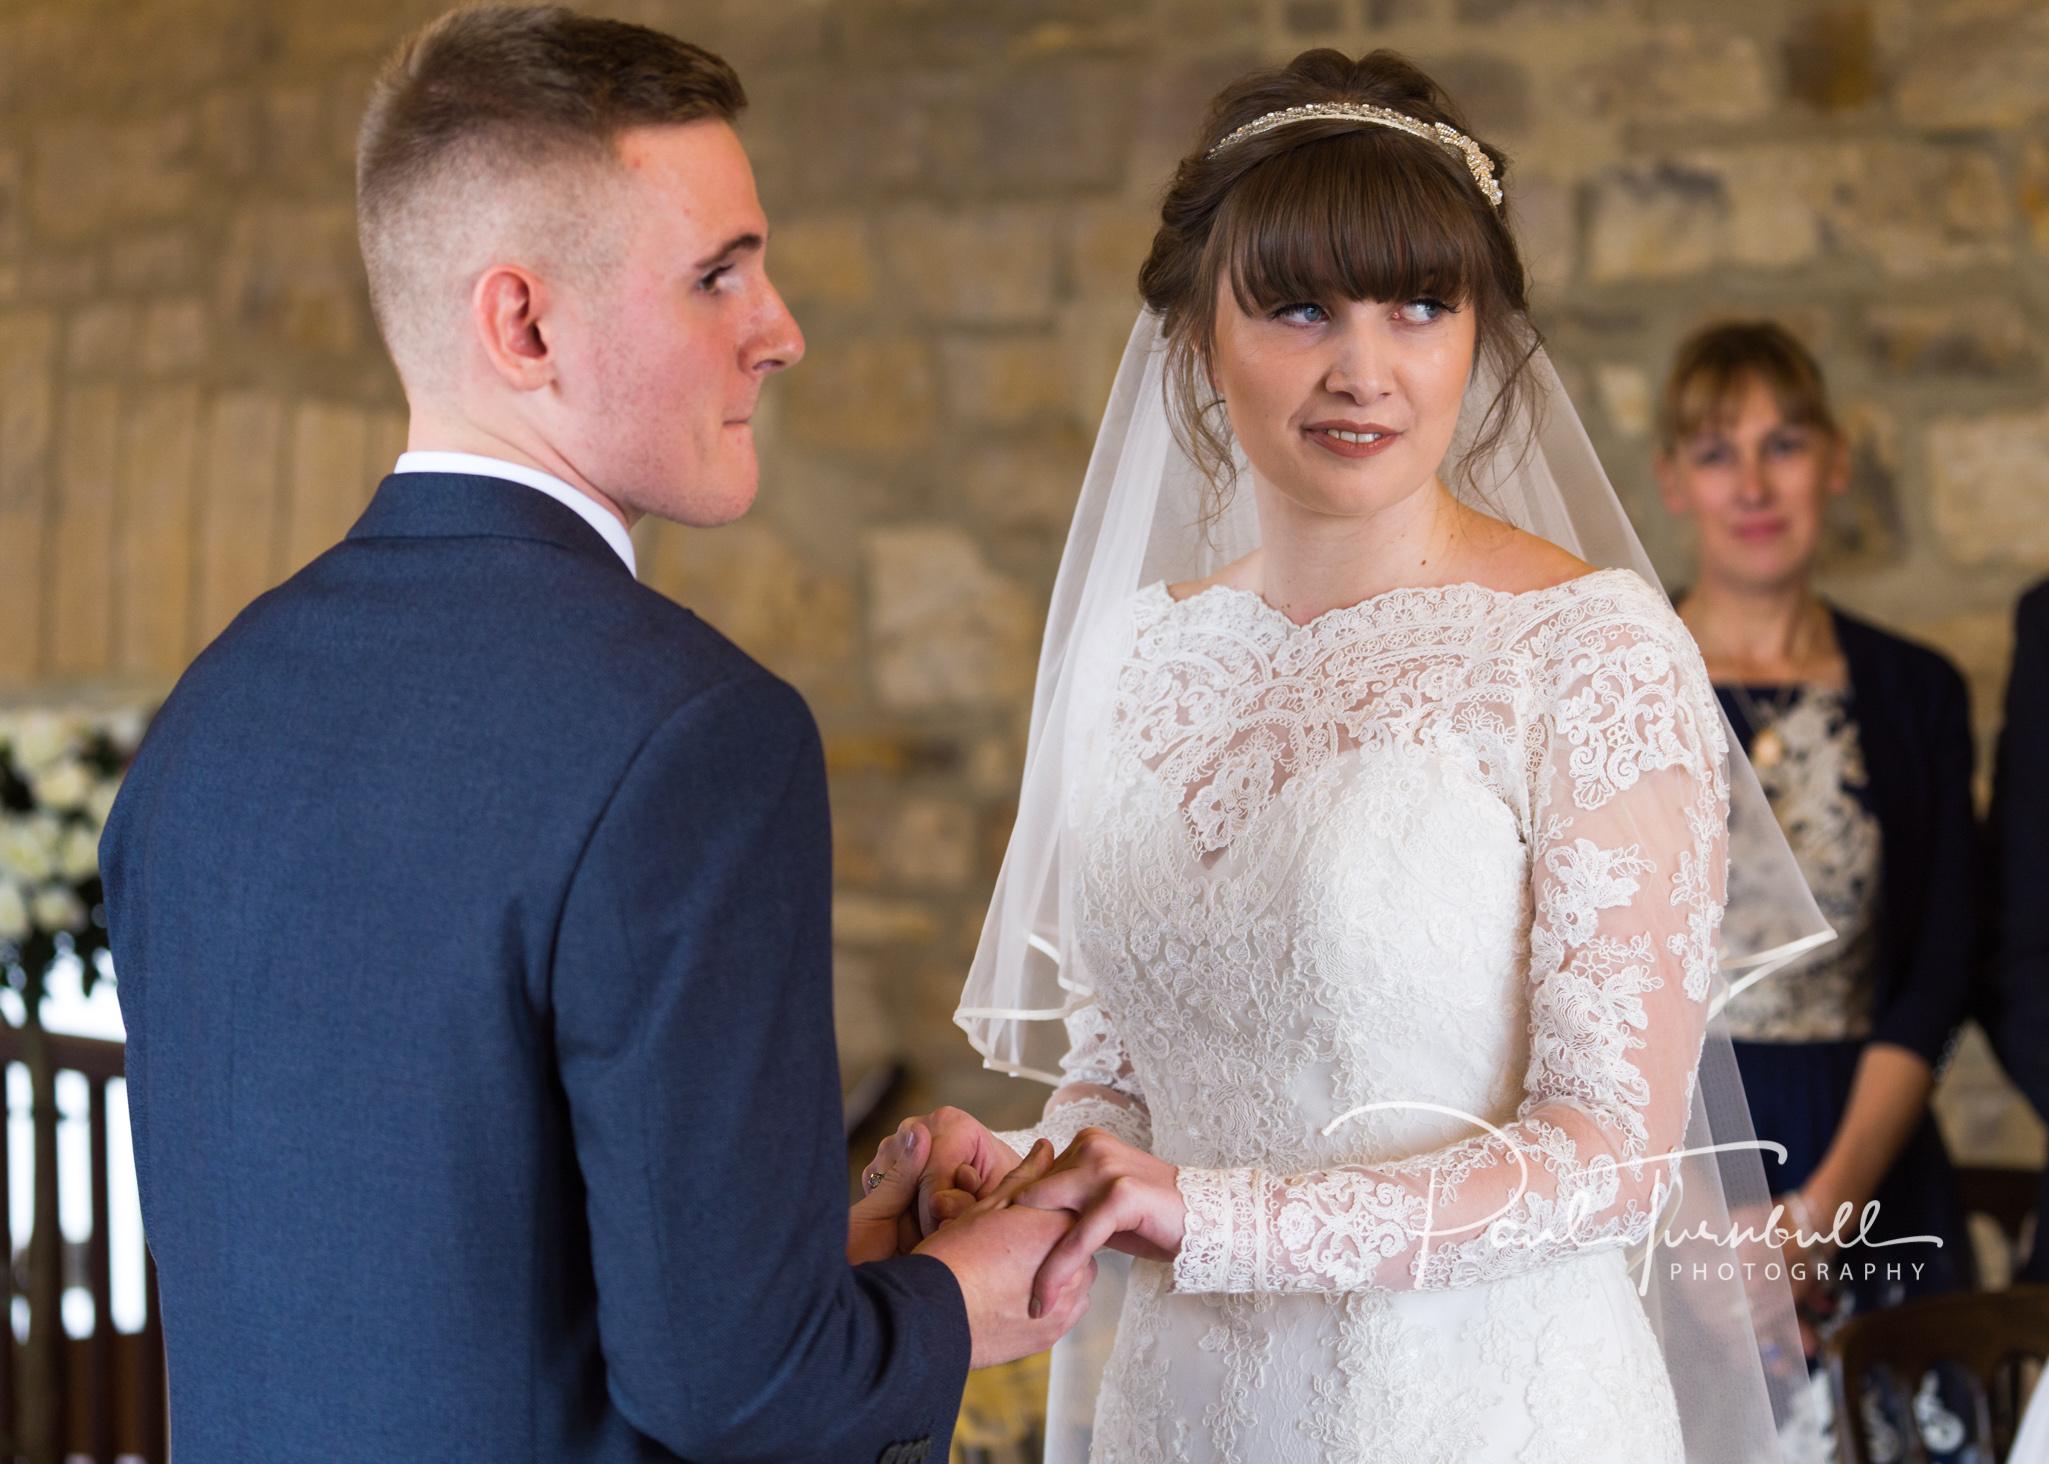 wedding-photographer-raven-hall-ravenscroft--scarborough-yorkshire-lucy-ryan-043.jpg